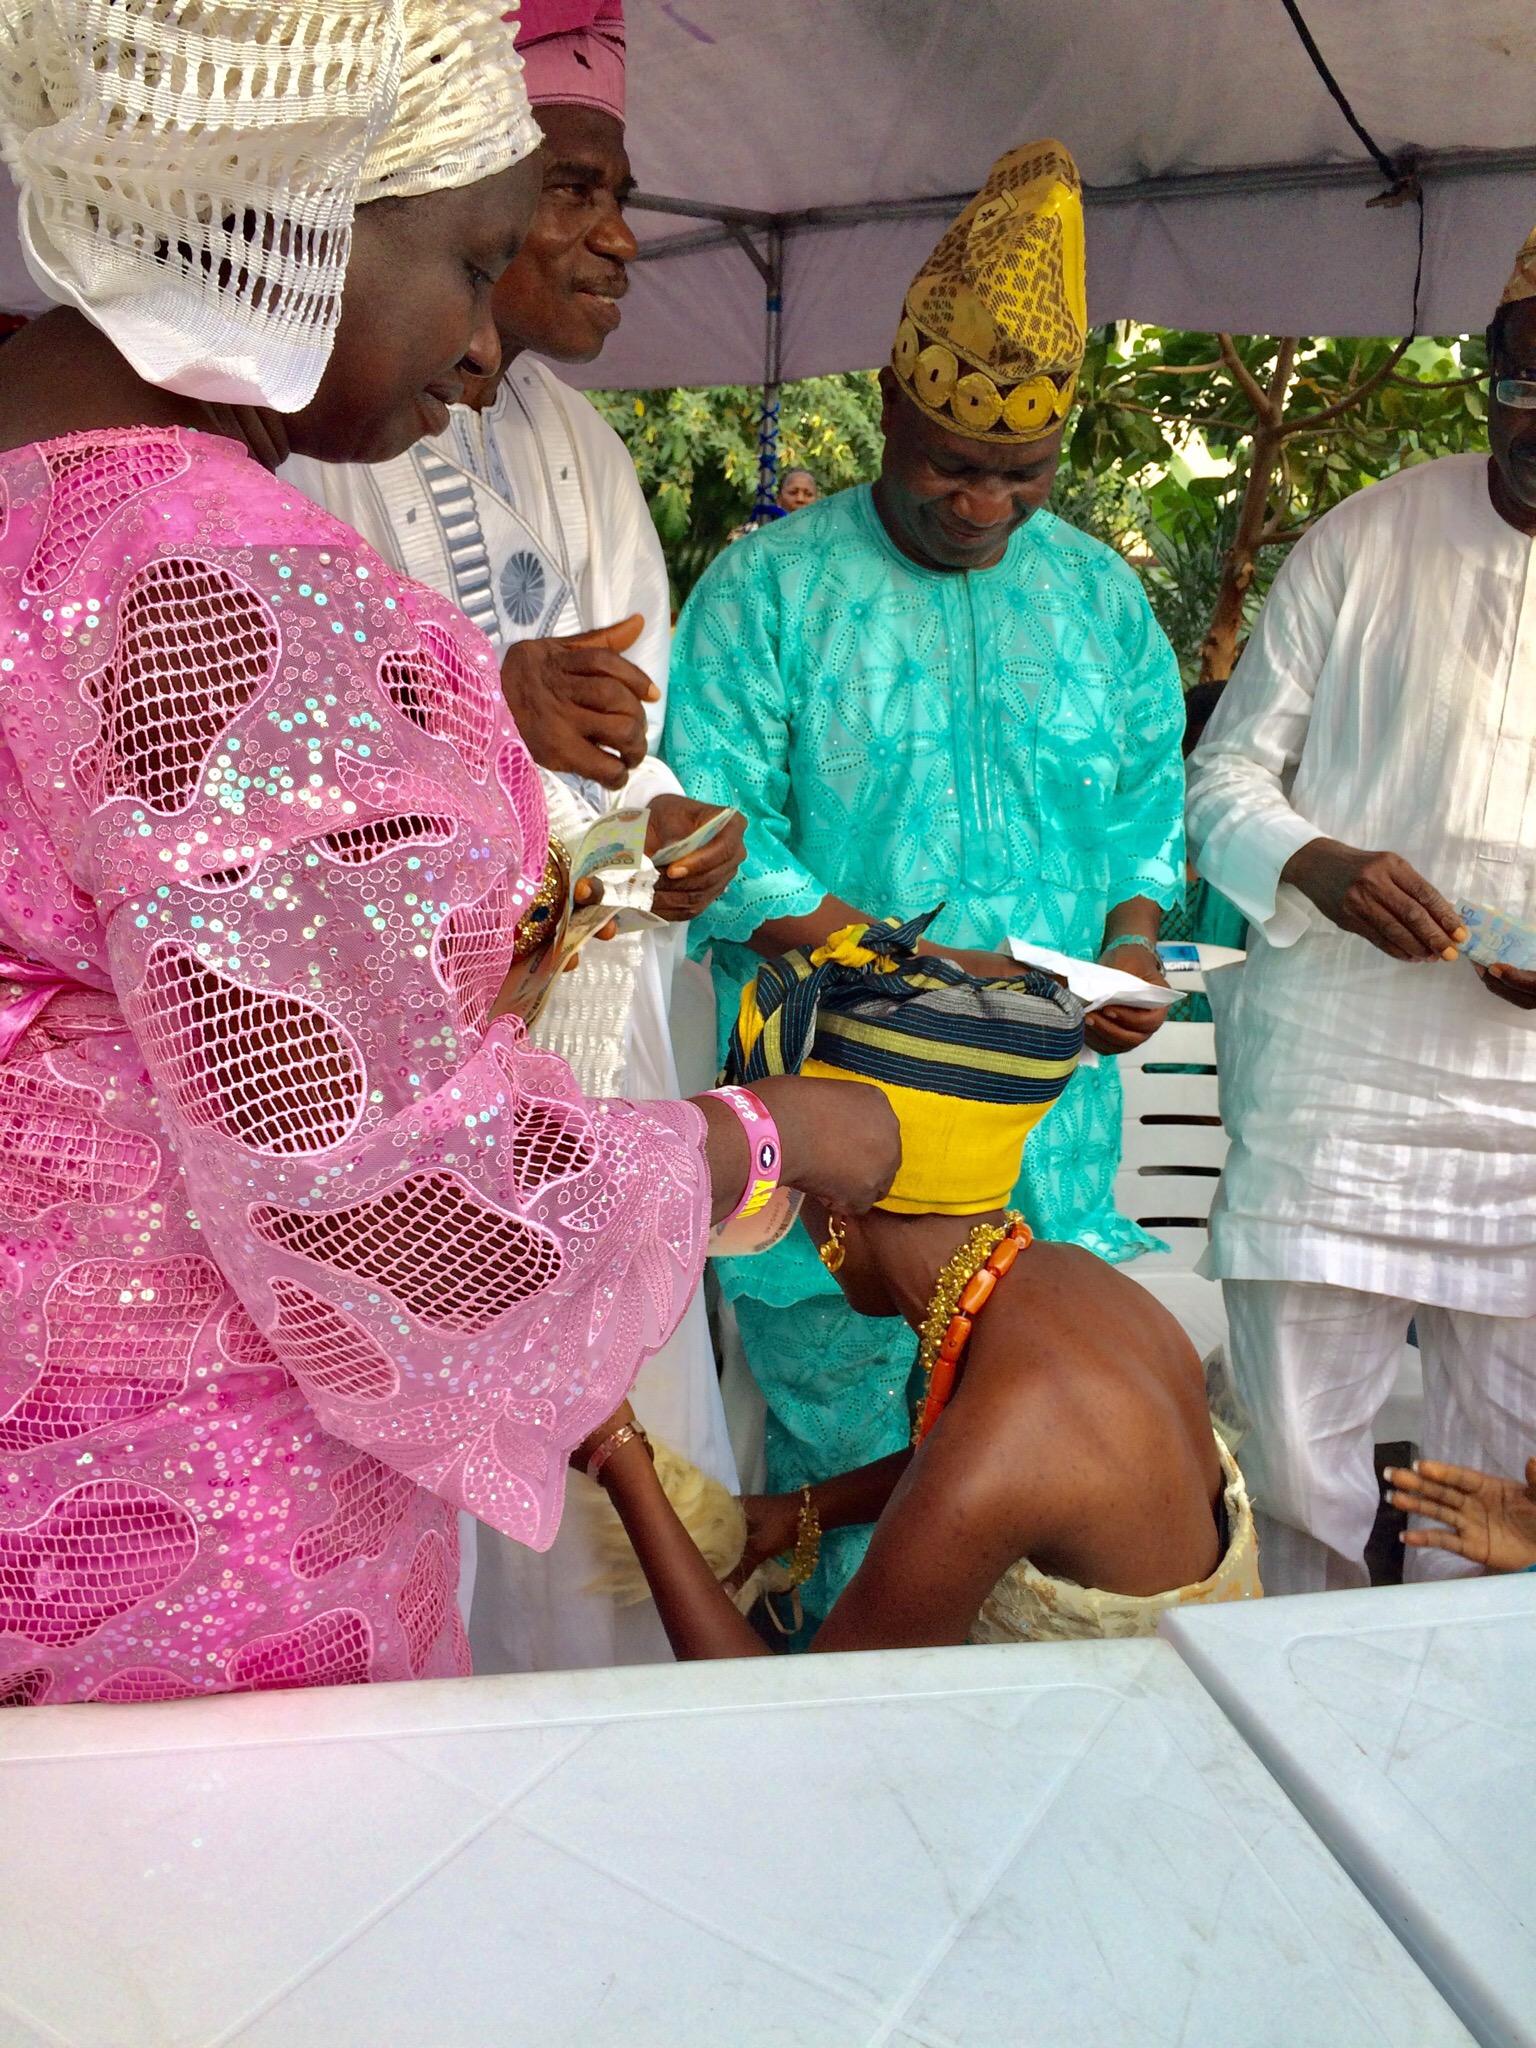 Groom's (Deji's) parents spraying money on the bride (Kedono, Jummai)